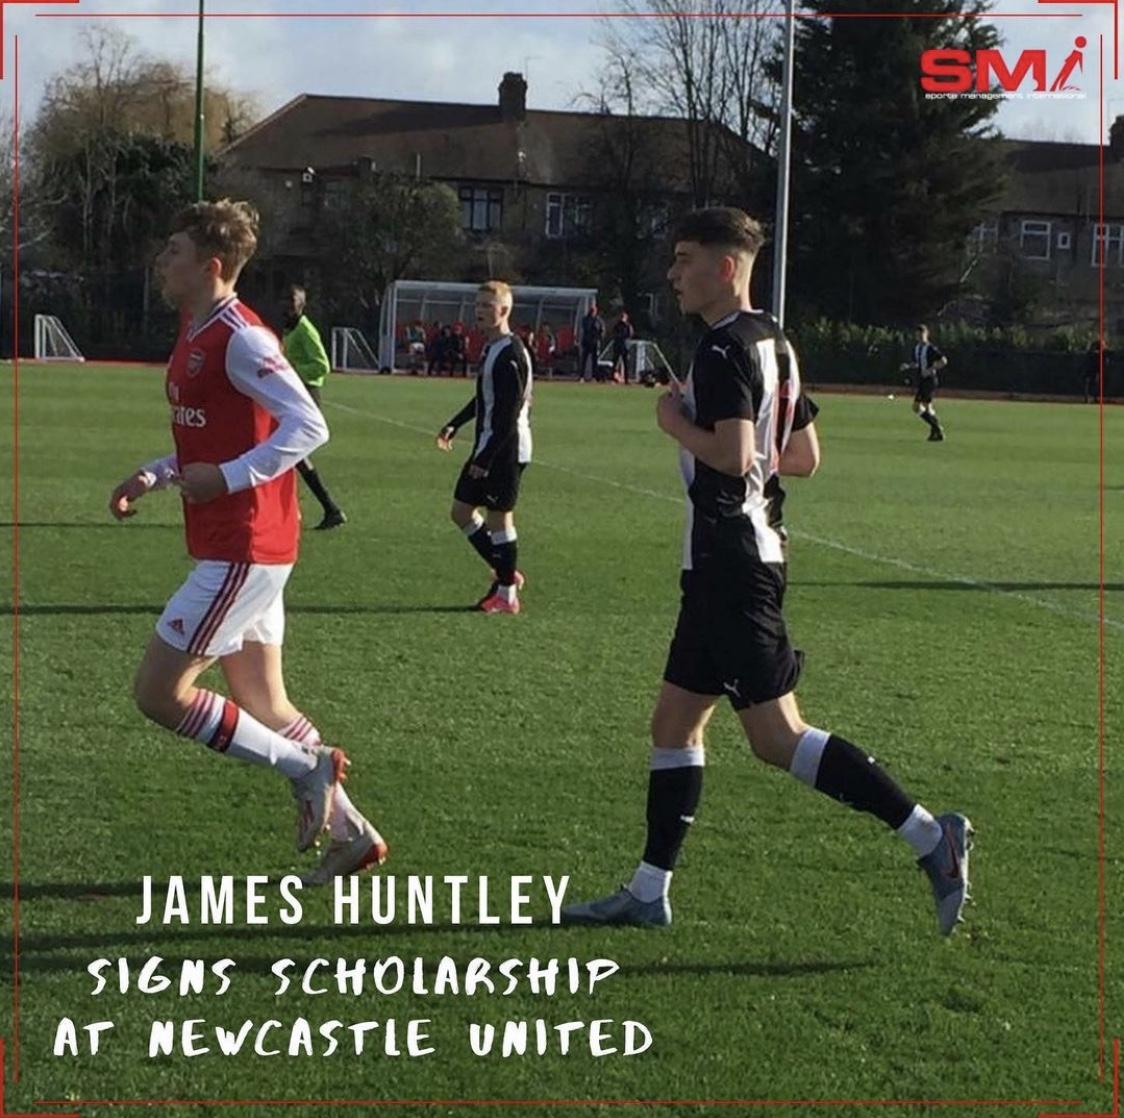 James Huntley signs scholarship